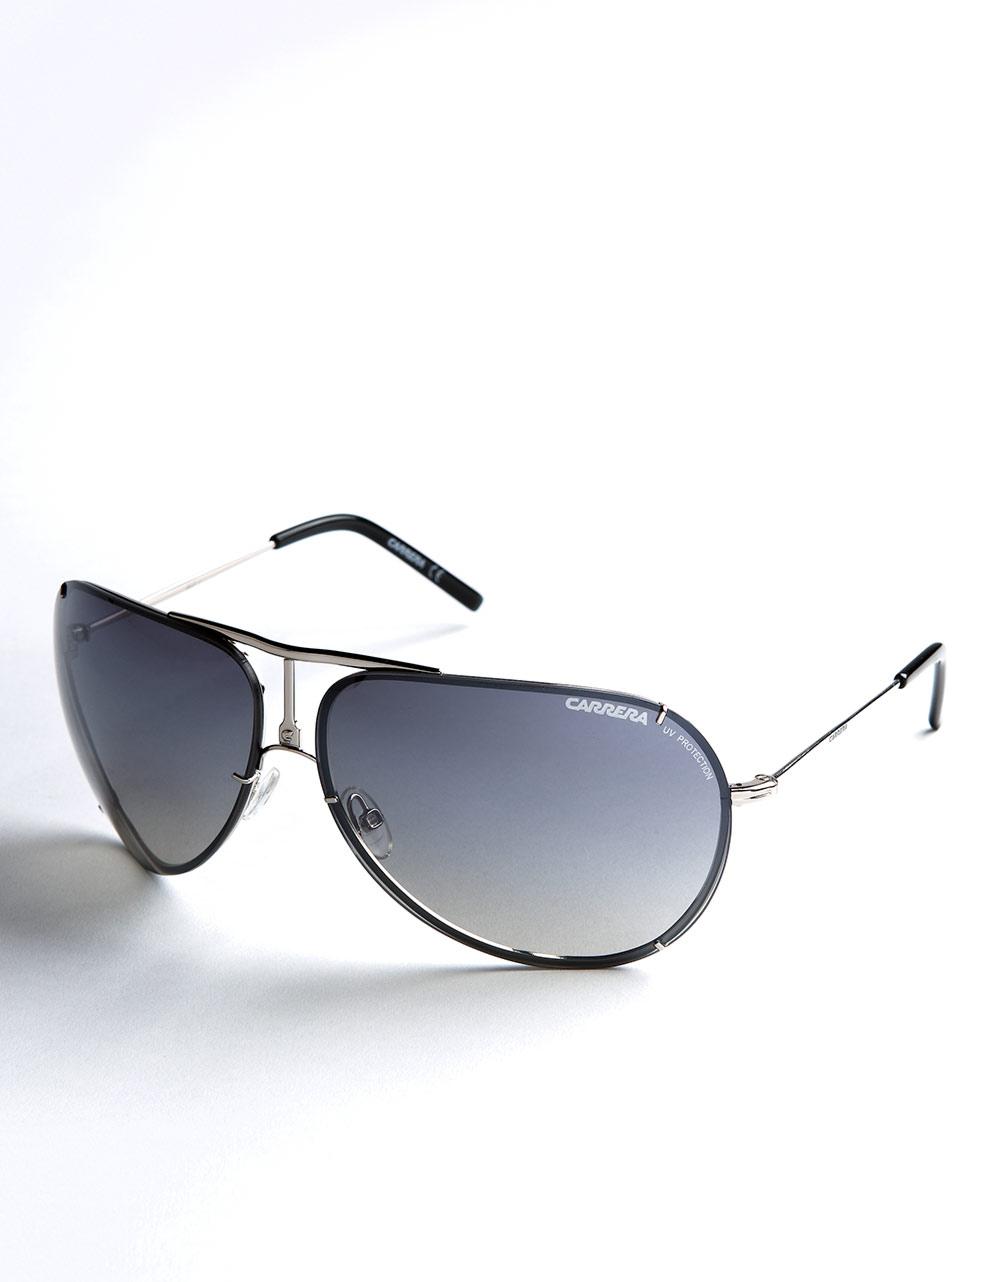 Carrera Vintage Aviator Sunglasses Louisiana Bucket Brigade